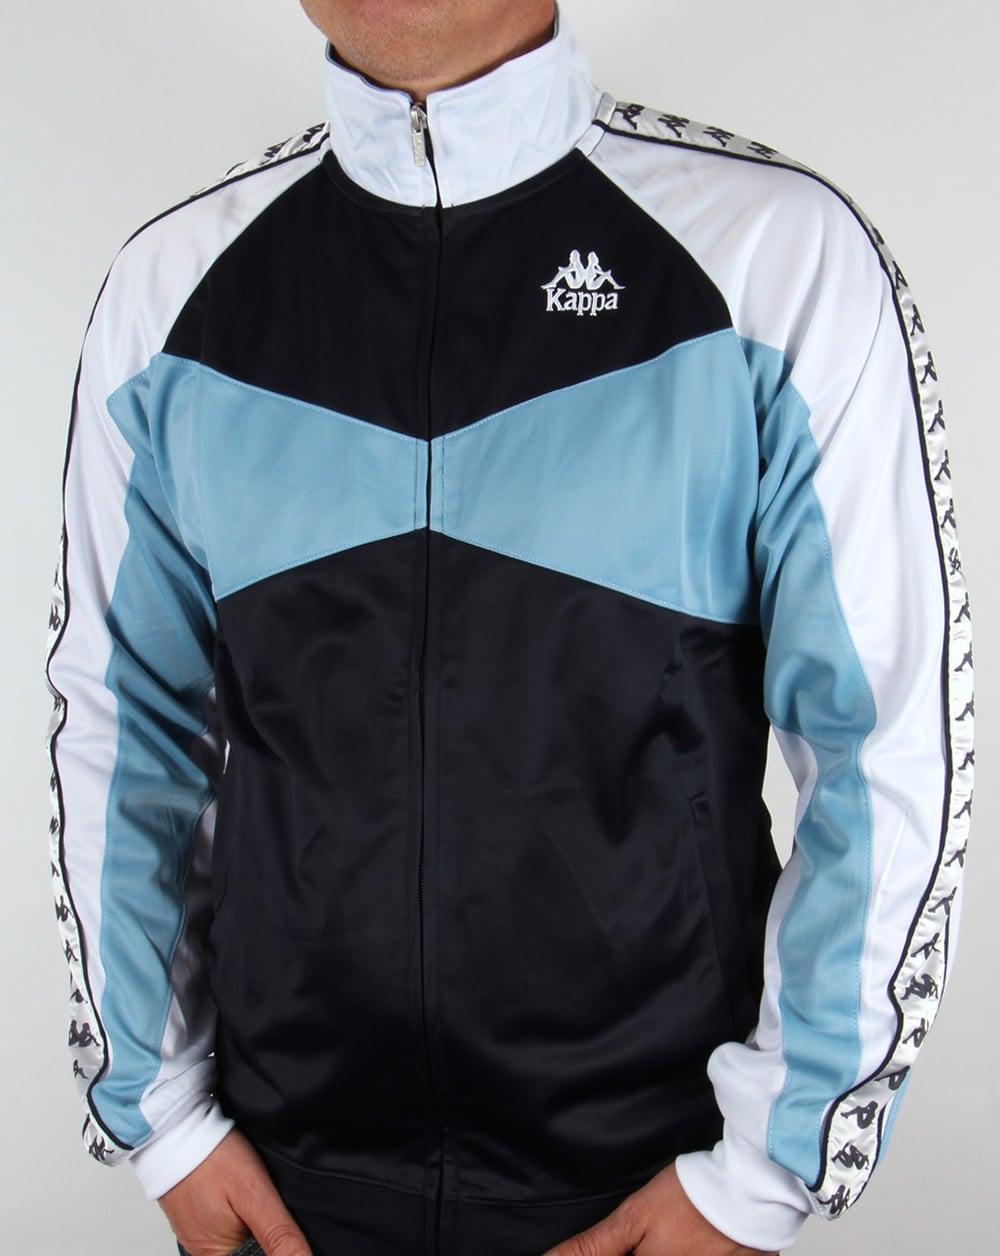 Di Top Robe Kappa Trafford tracksuit mens jacket Track Navyskywhite zOnU7dnR